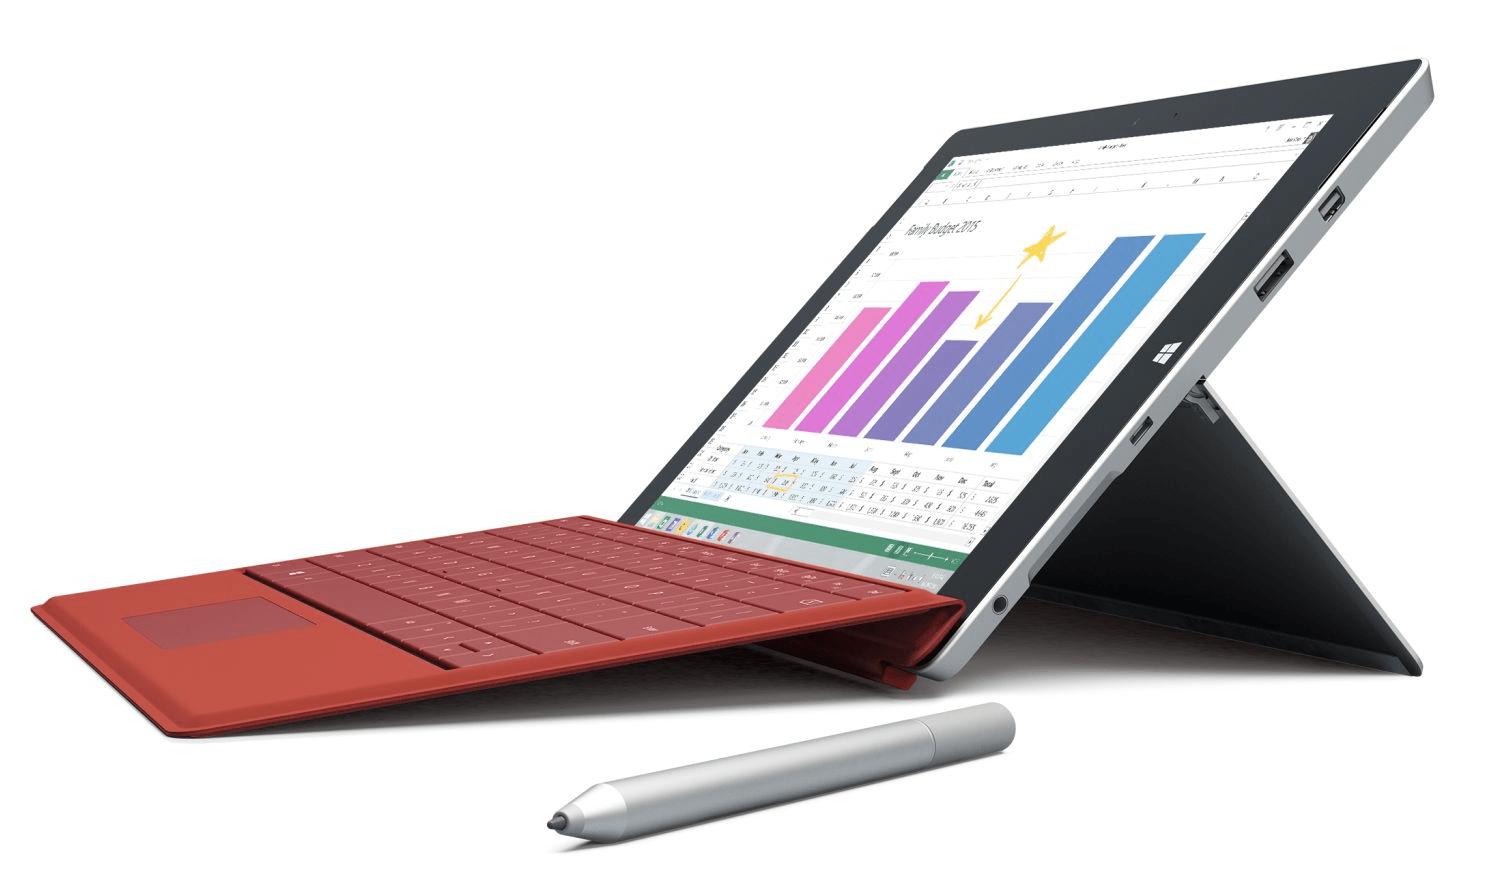 Surface 3 keyboard not working reanimators